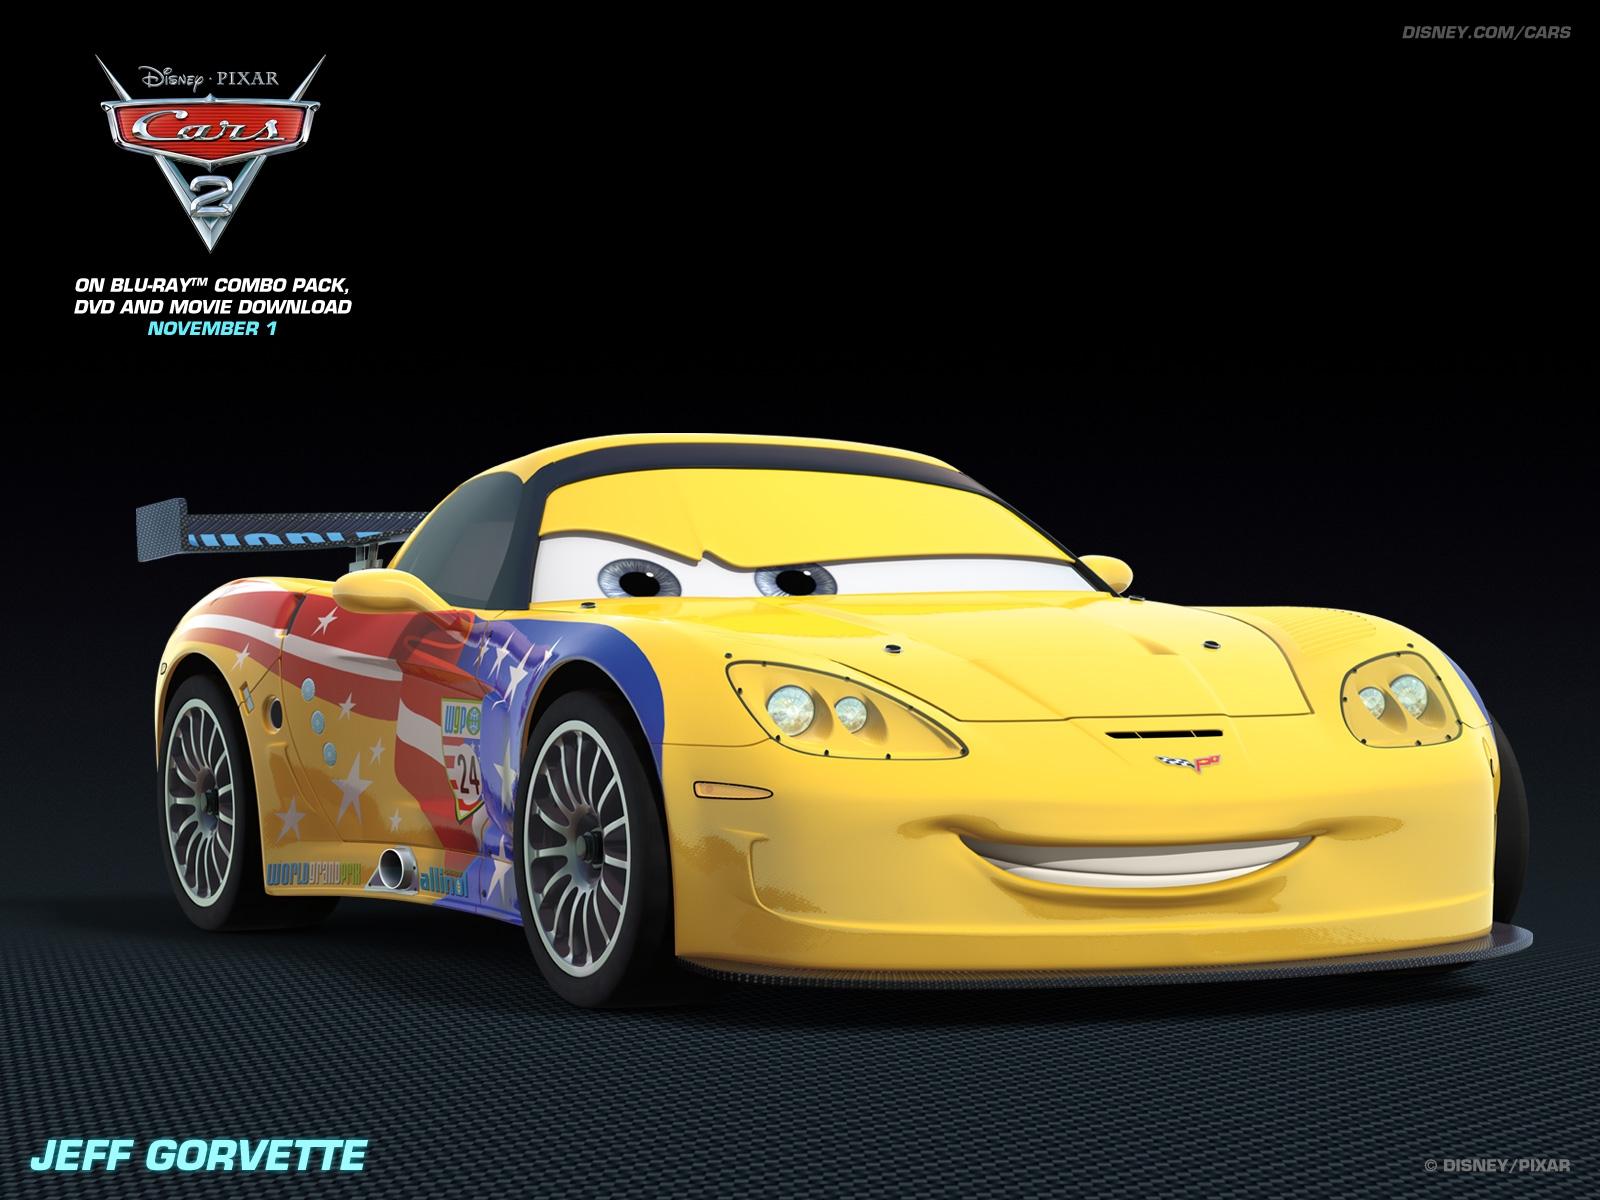 jeff grovette disney pixar cars 2 free hd wallpaper 1600 1200